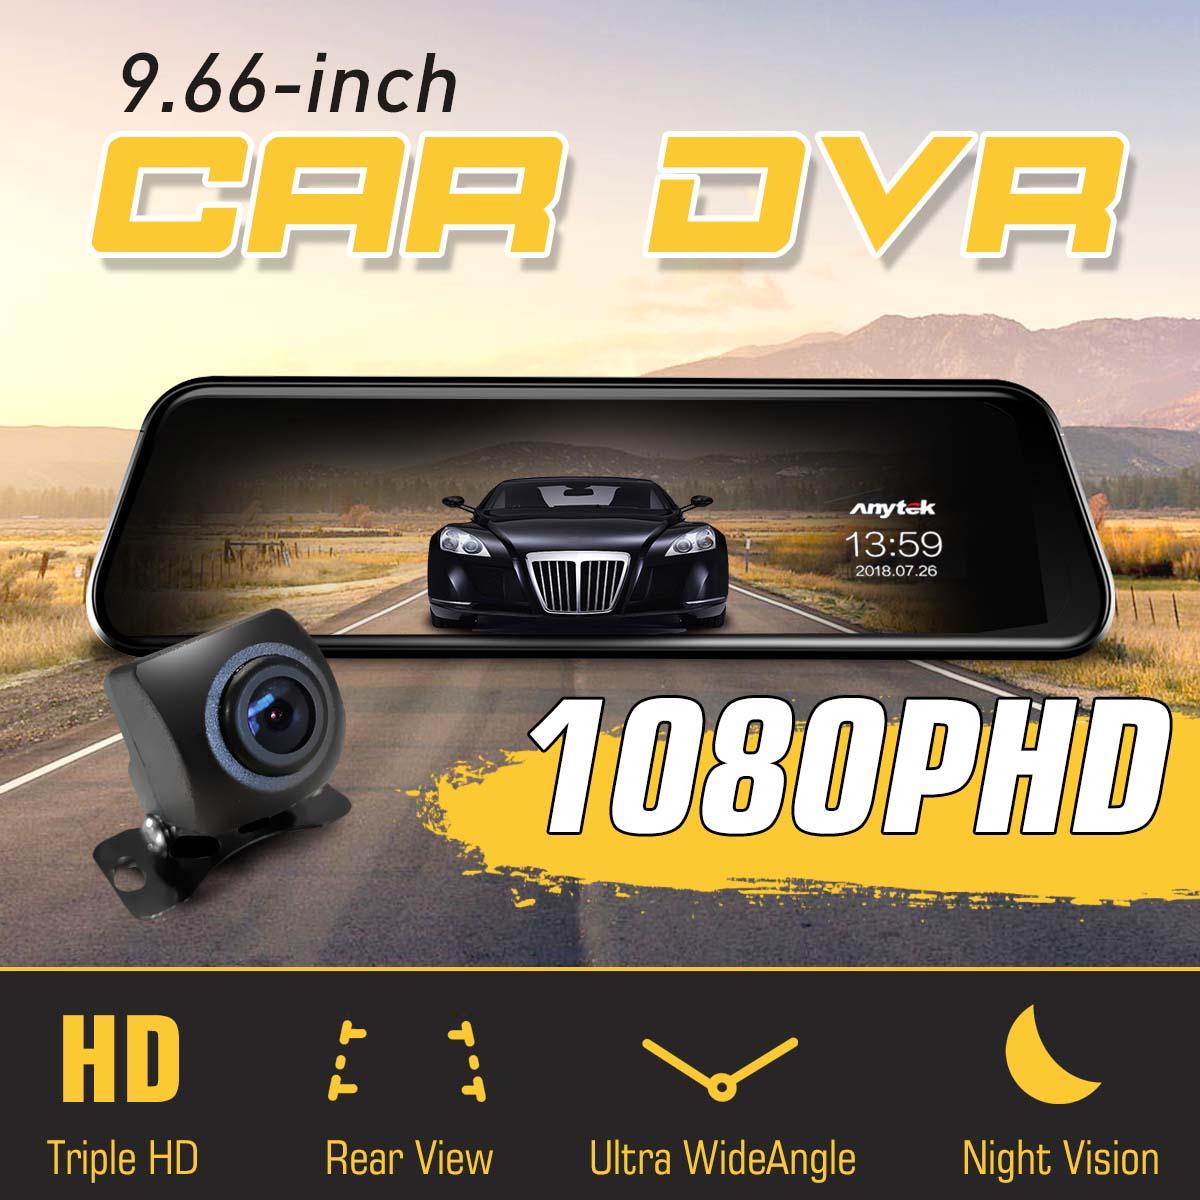 Car Traffic Recorder DVR Camera Full HD 1080P 9.66inch Stream Media Rearview Mirror Dual Lens Video Data Recorder Night VisionCar Traffic Recorder DVR Camera Full HD 1080P 9.66inch Stream Media Rearview Mirror Dual Lens Video Data Recorder Night Vision